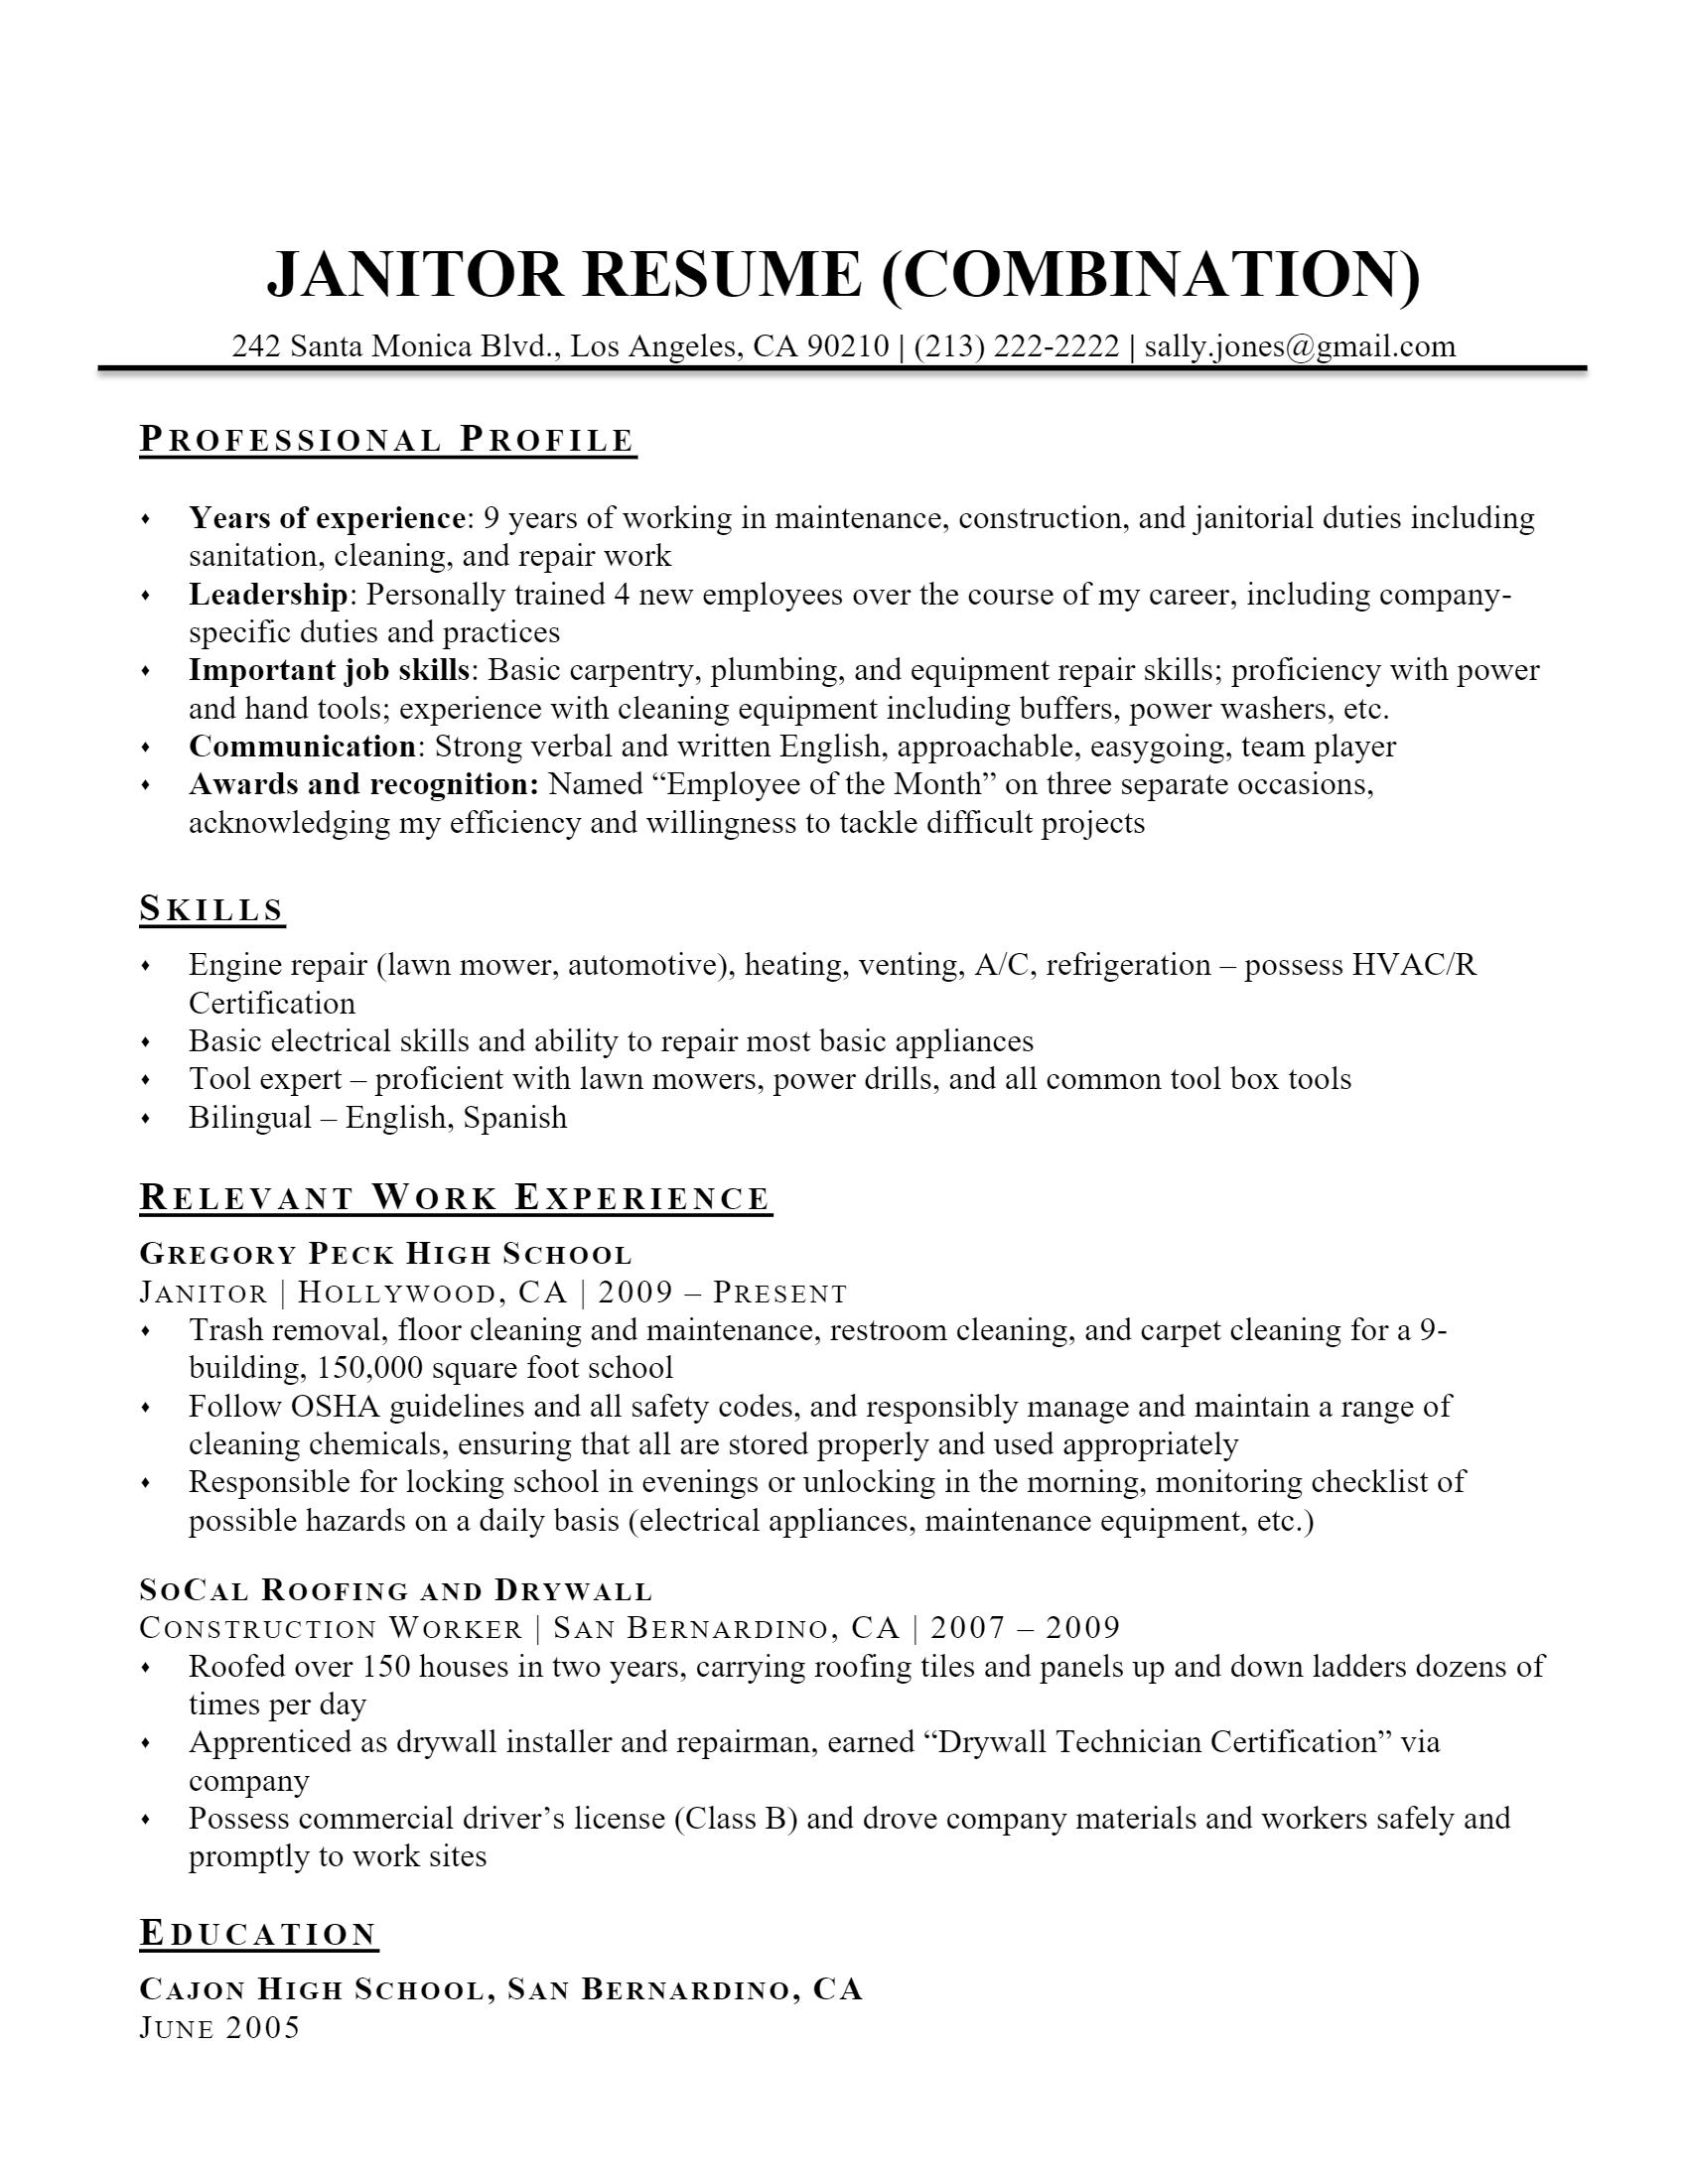 Janitor Resume > Janitor Resume .Docx (Word)